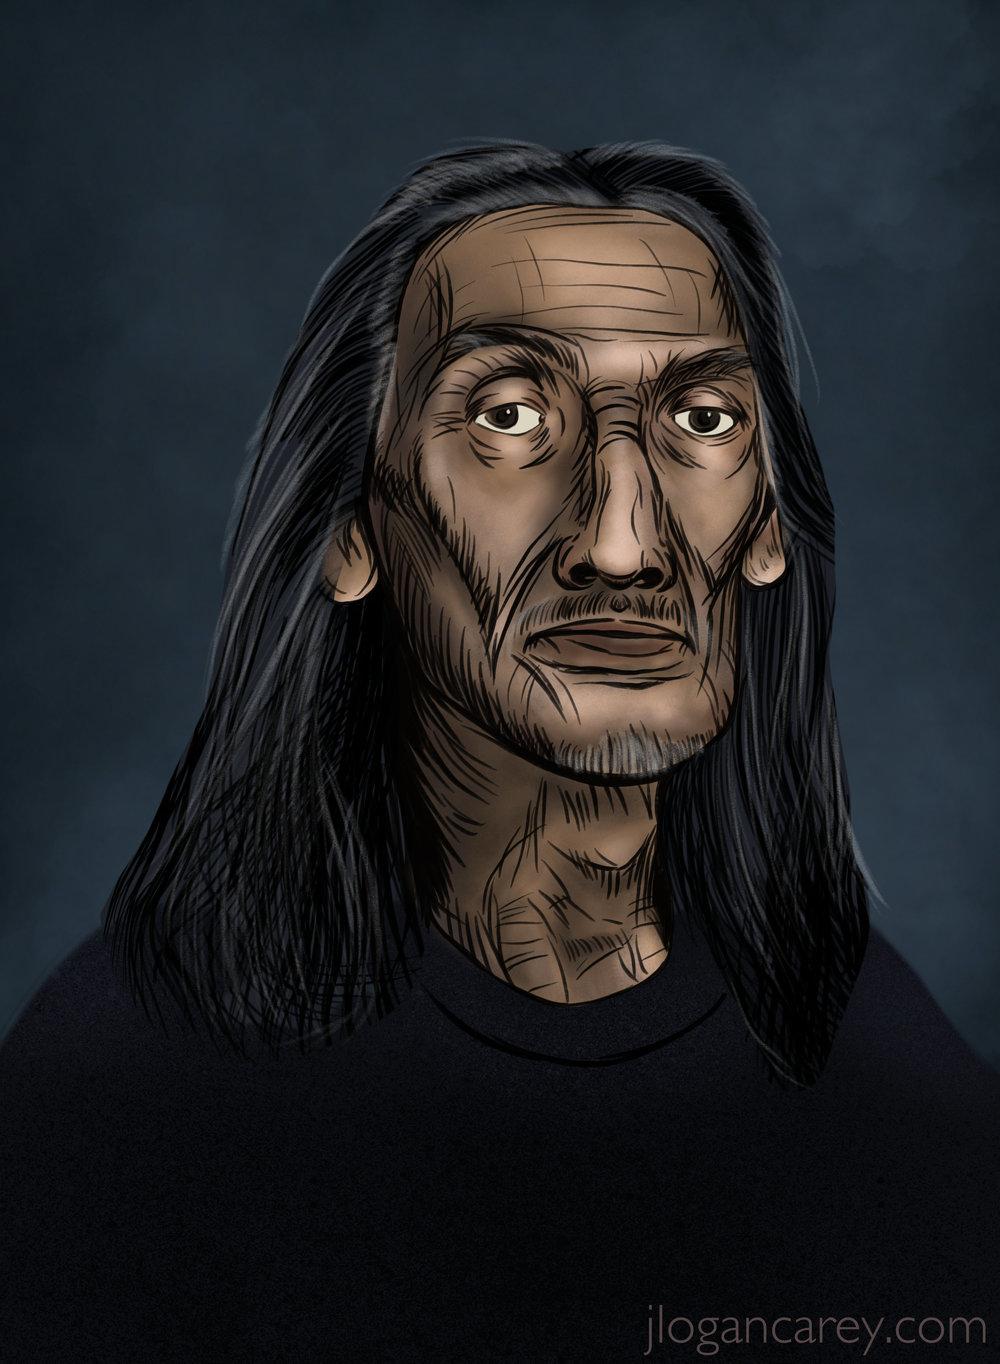 Nathan Phillips, Native American Activist